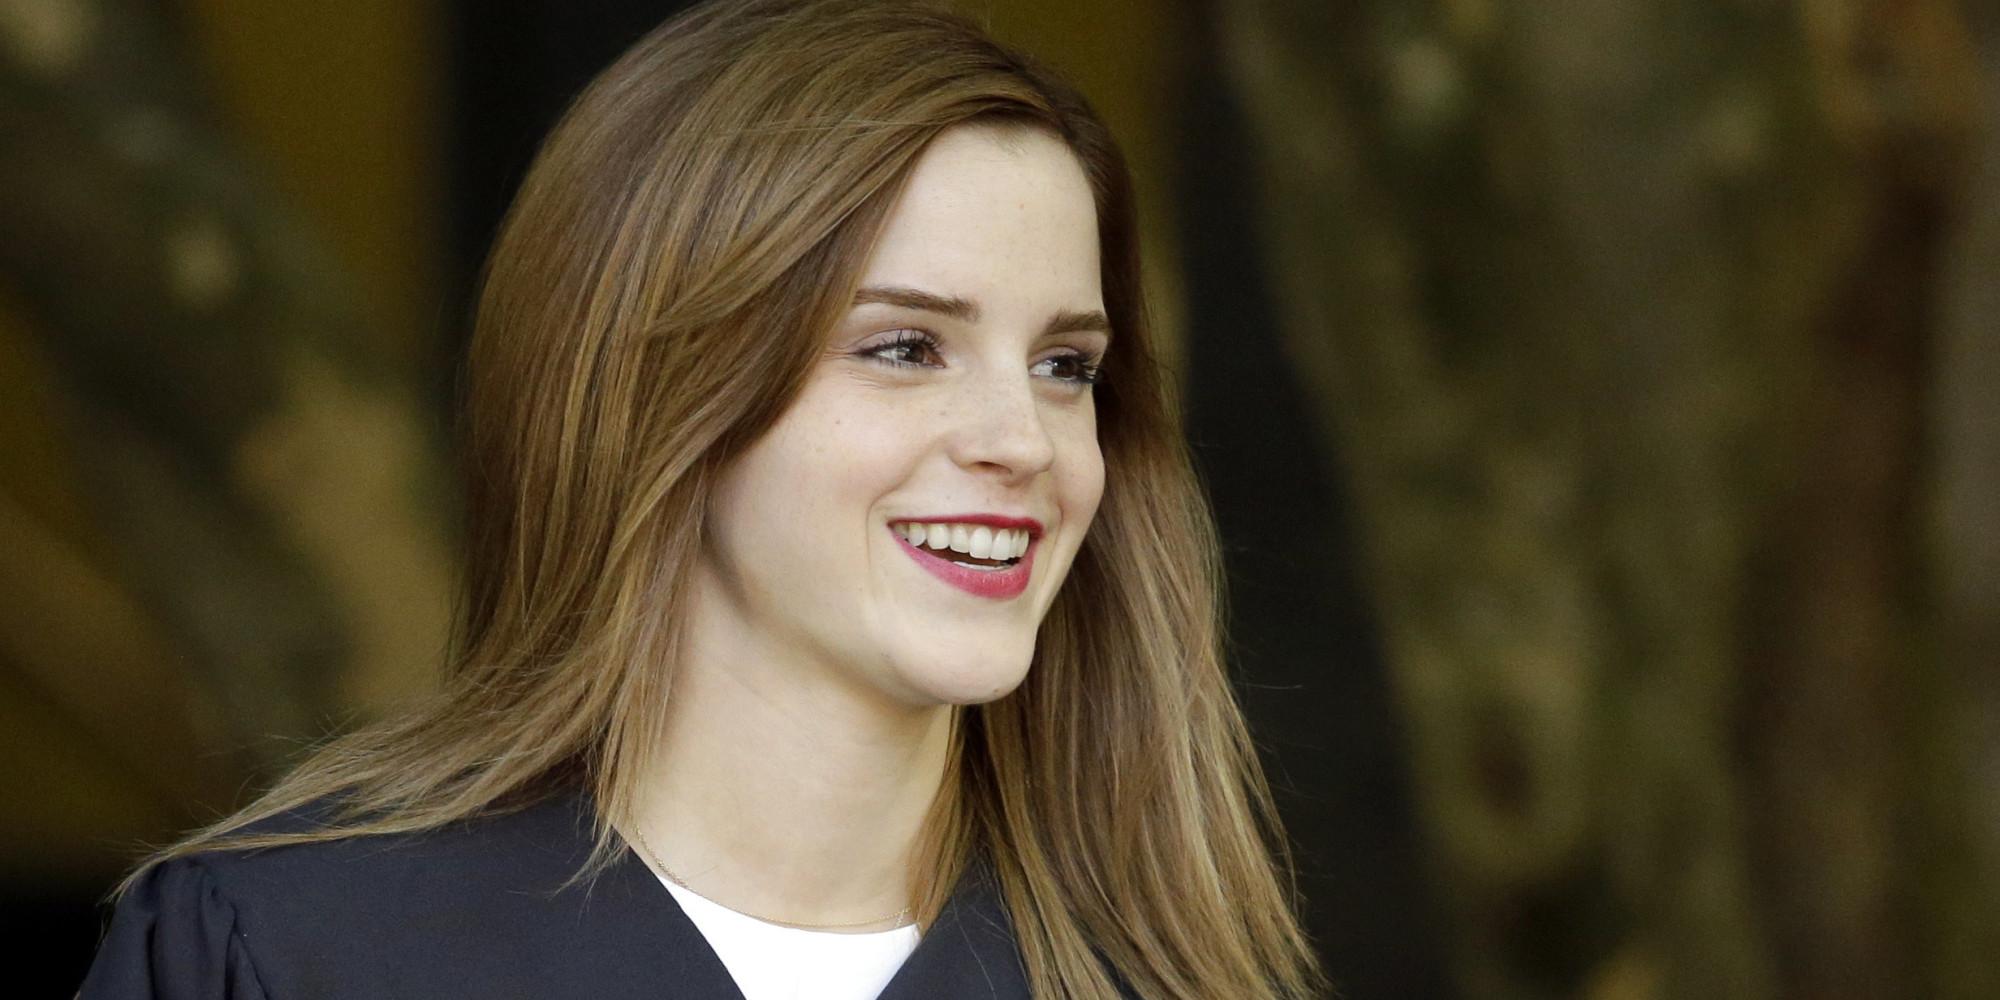 Emma Watson Graduates, Joins Long List Of Ivy League Celebs